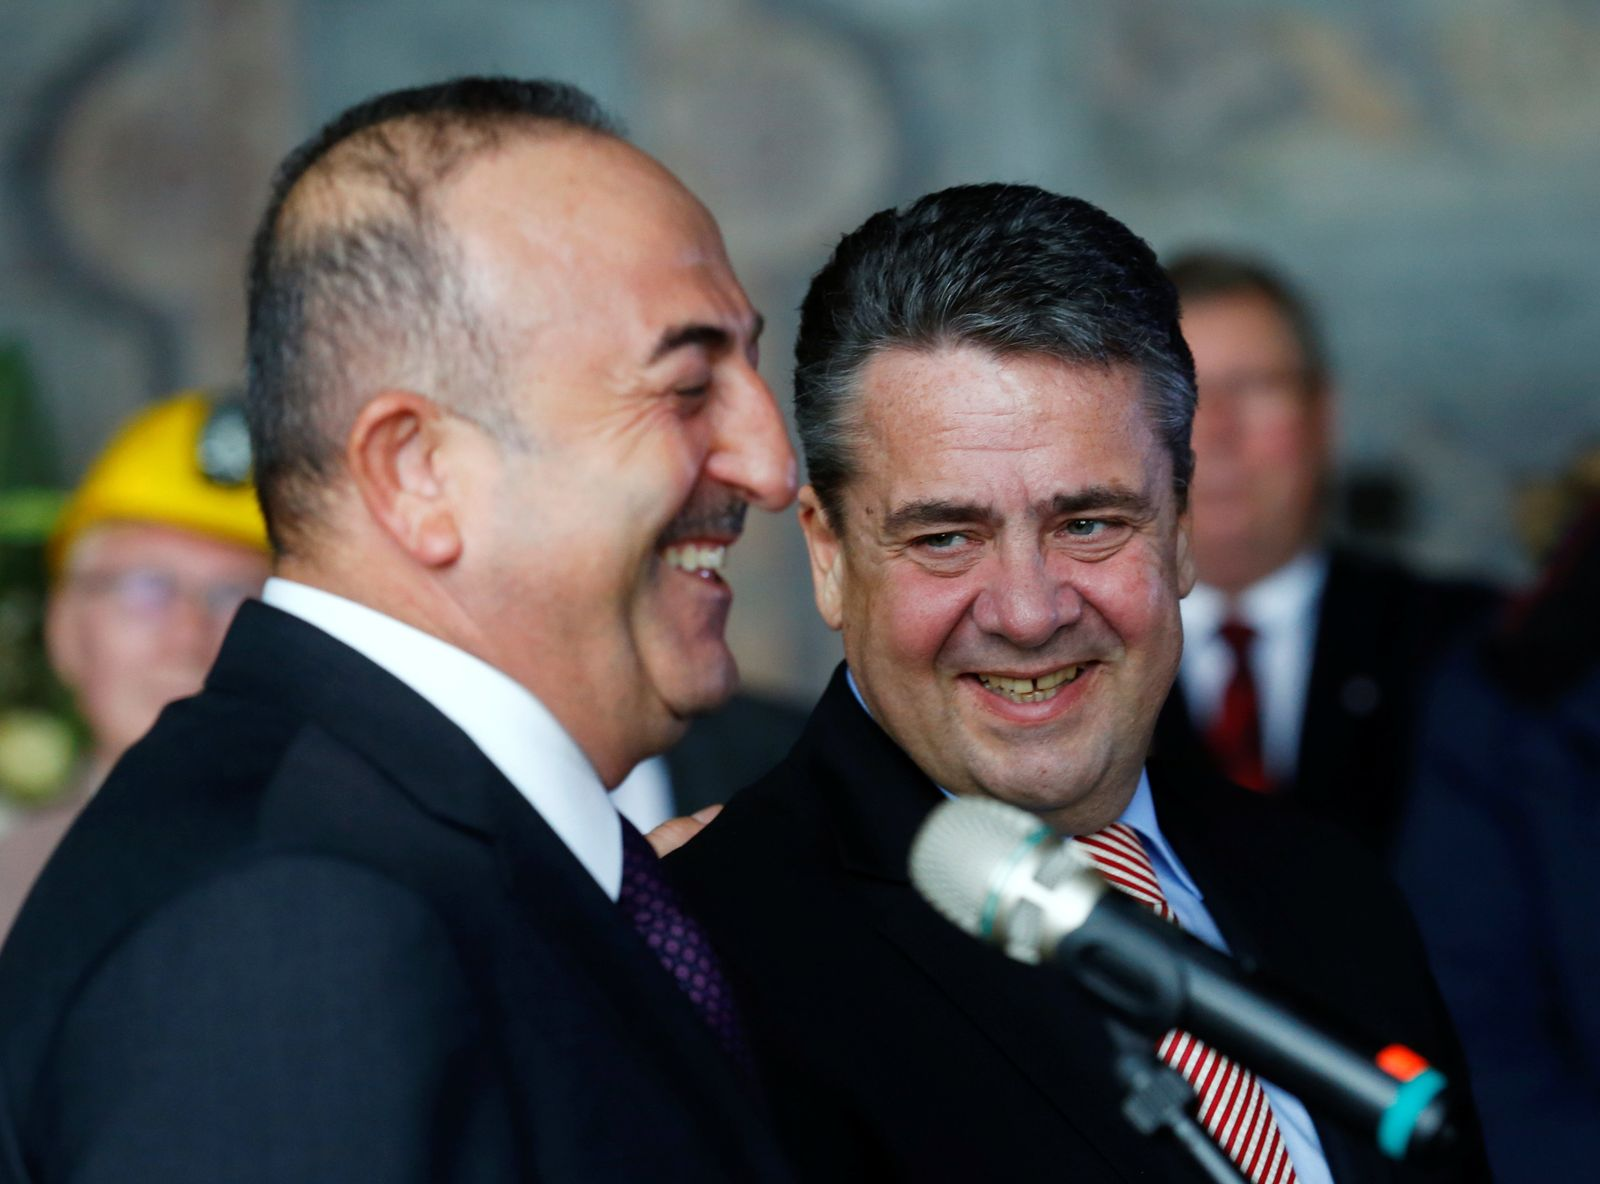 Sigmar Gabriel and his Turkish counterpart Mevlut Cavusoglu